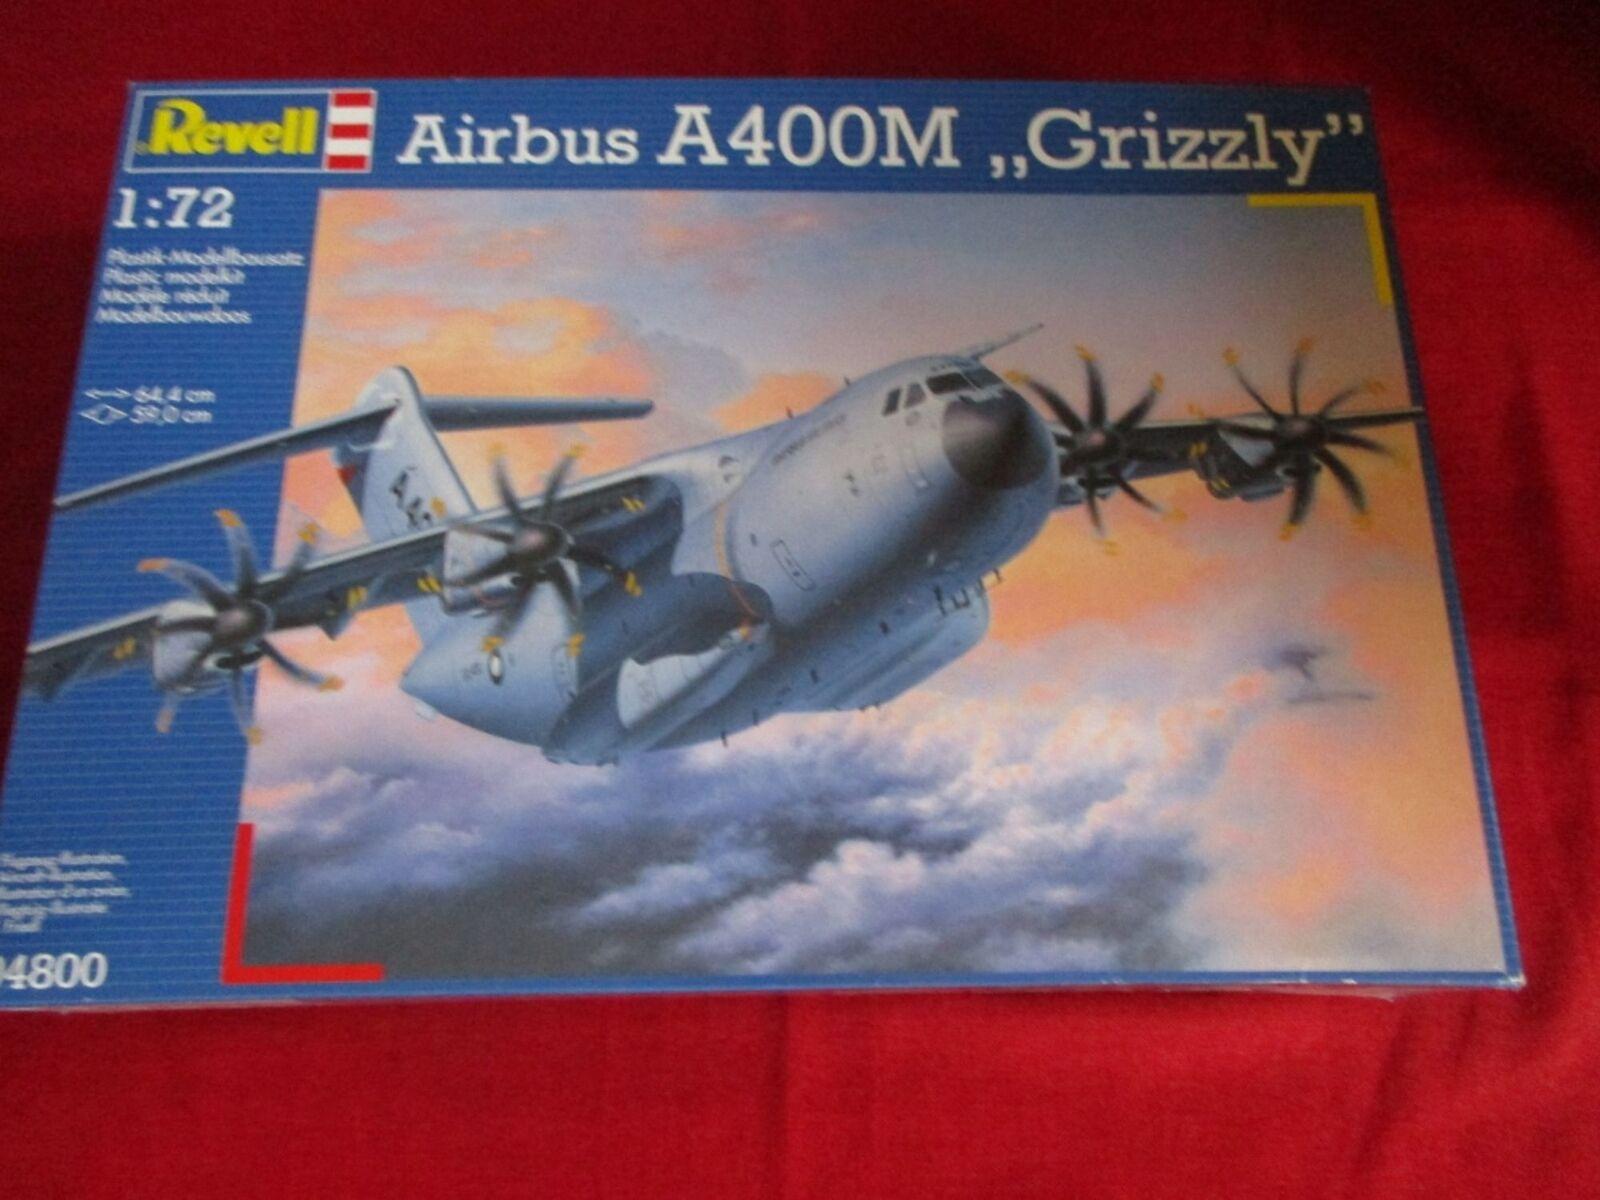 REVELL® 04800 1 72 72 72 Airbus A400M 'Grizzly' NEU OVP  | Der neueste Stil  b8be5e